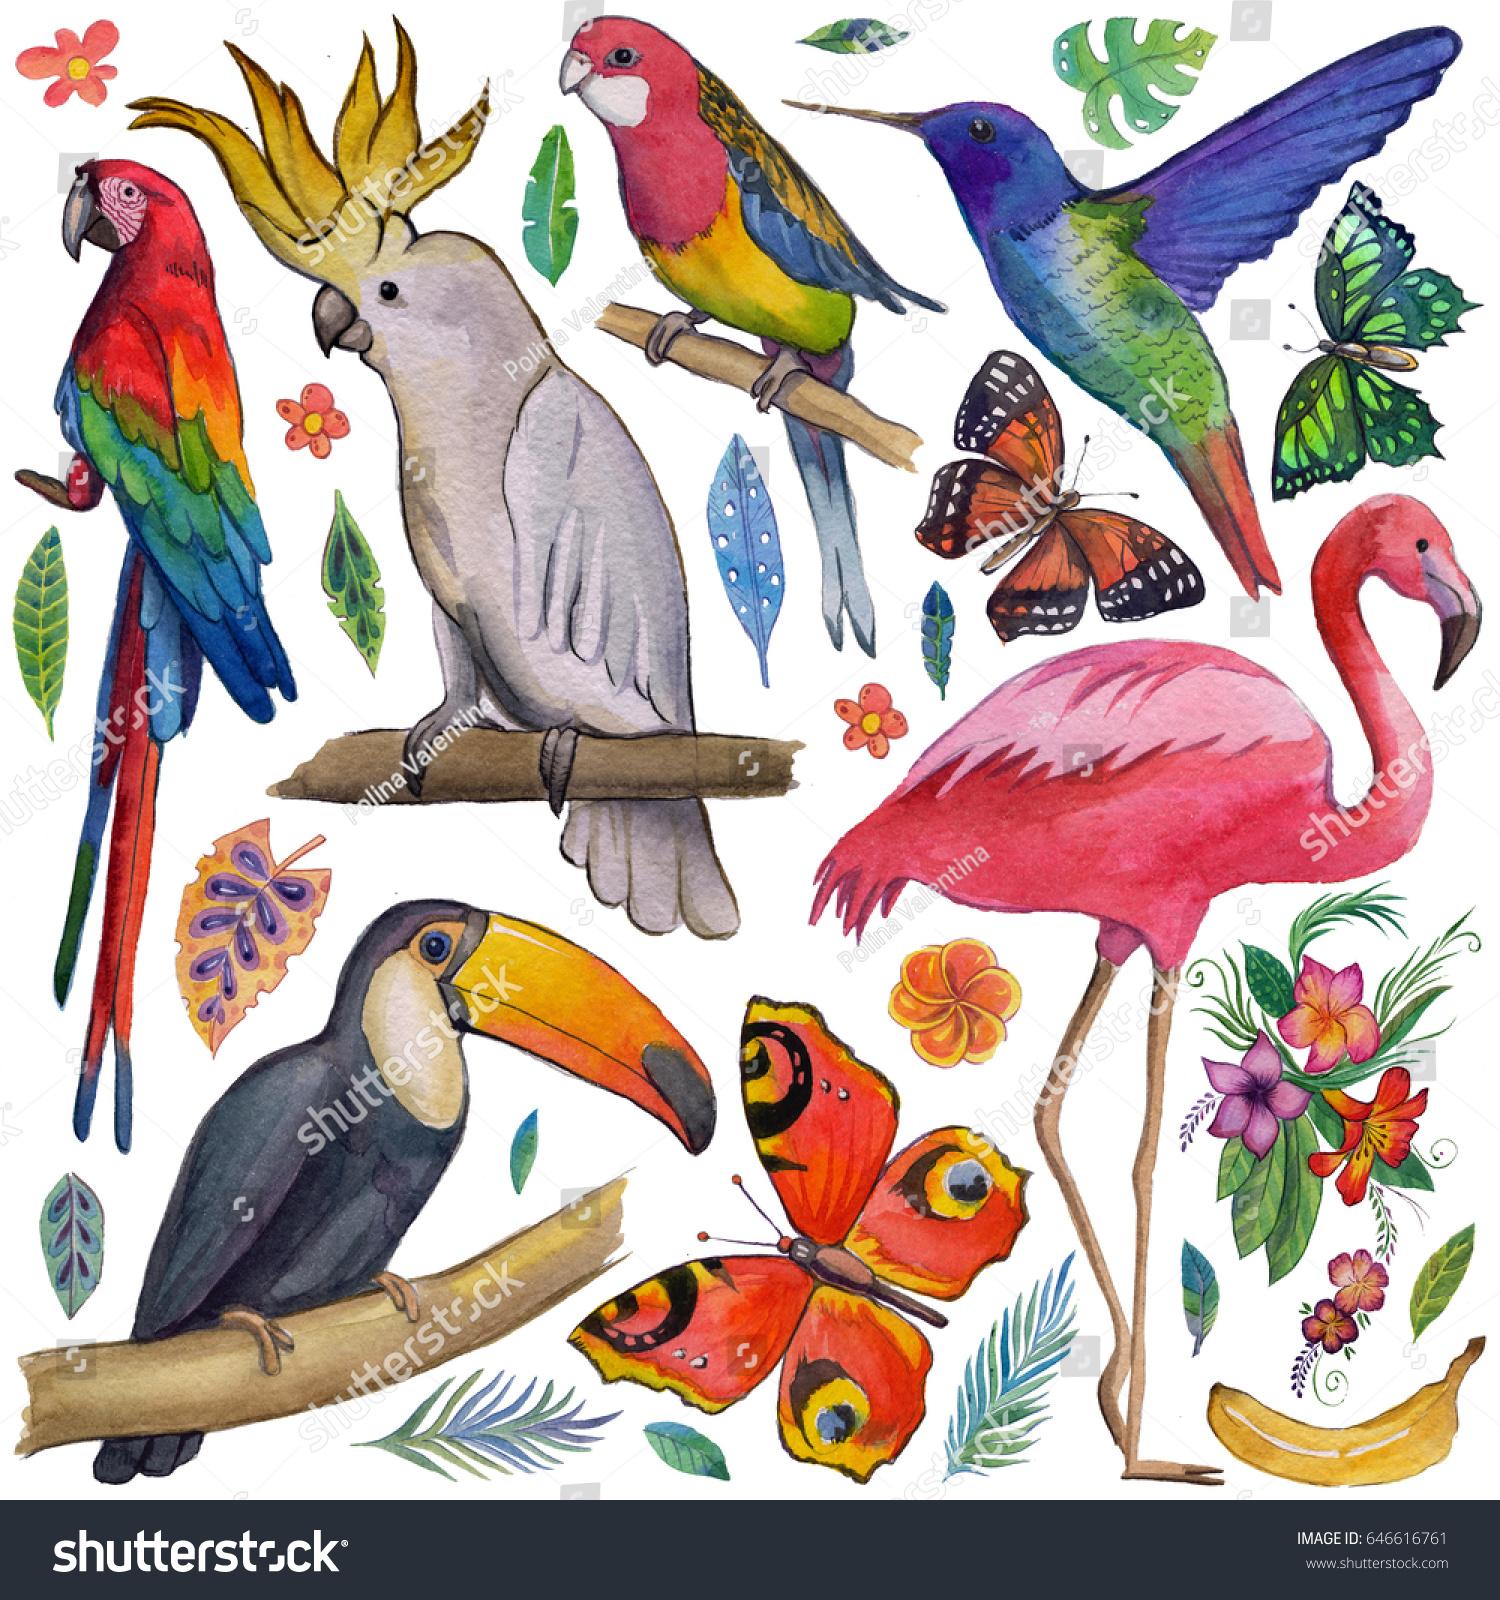 Tropical Summer Birds Toucan Parrot Exotic Flower Garden House Yard Flag